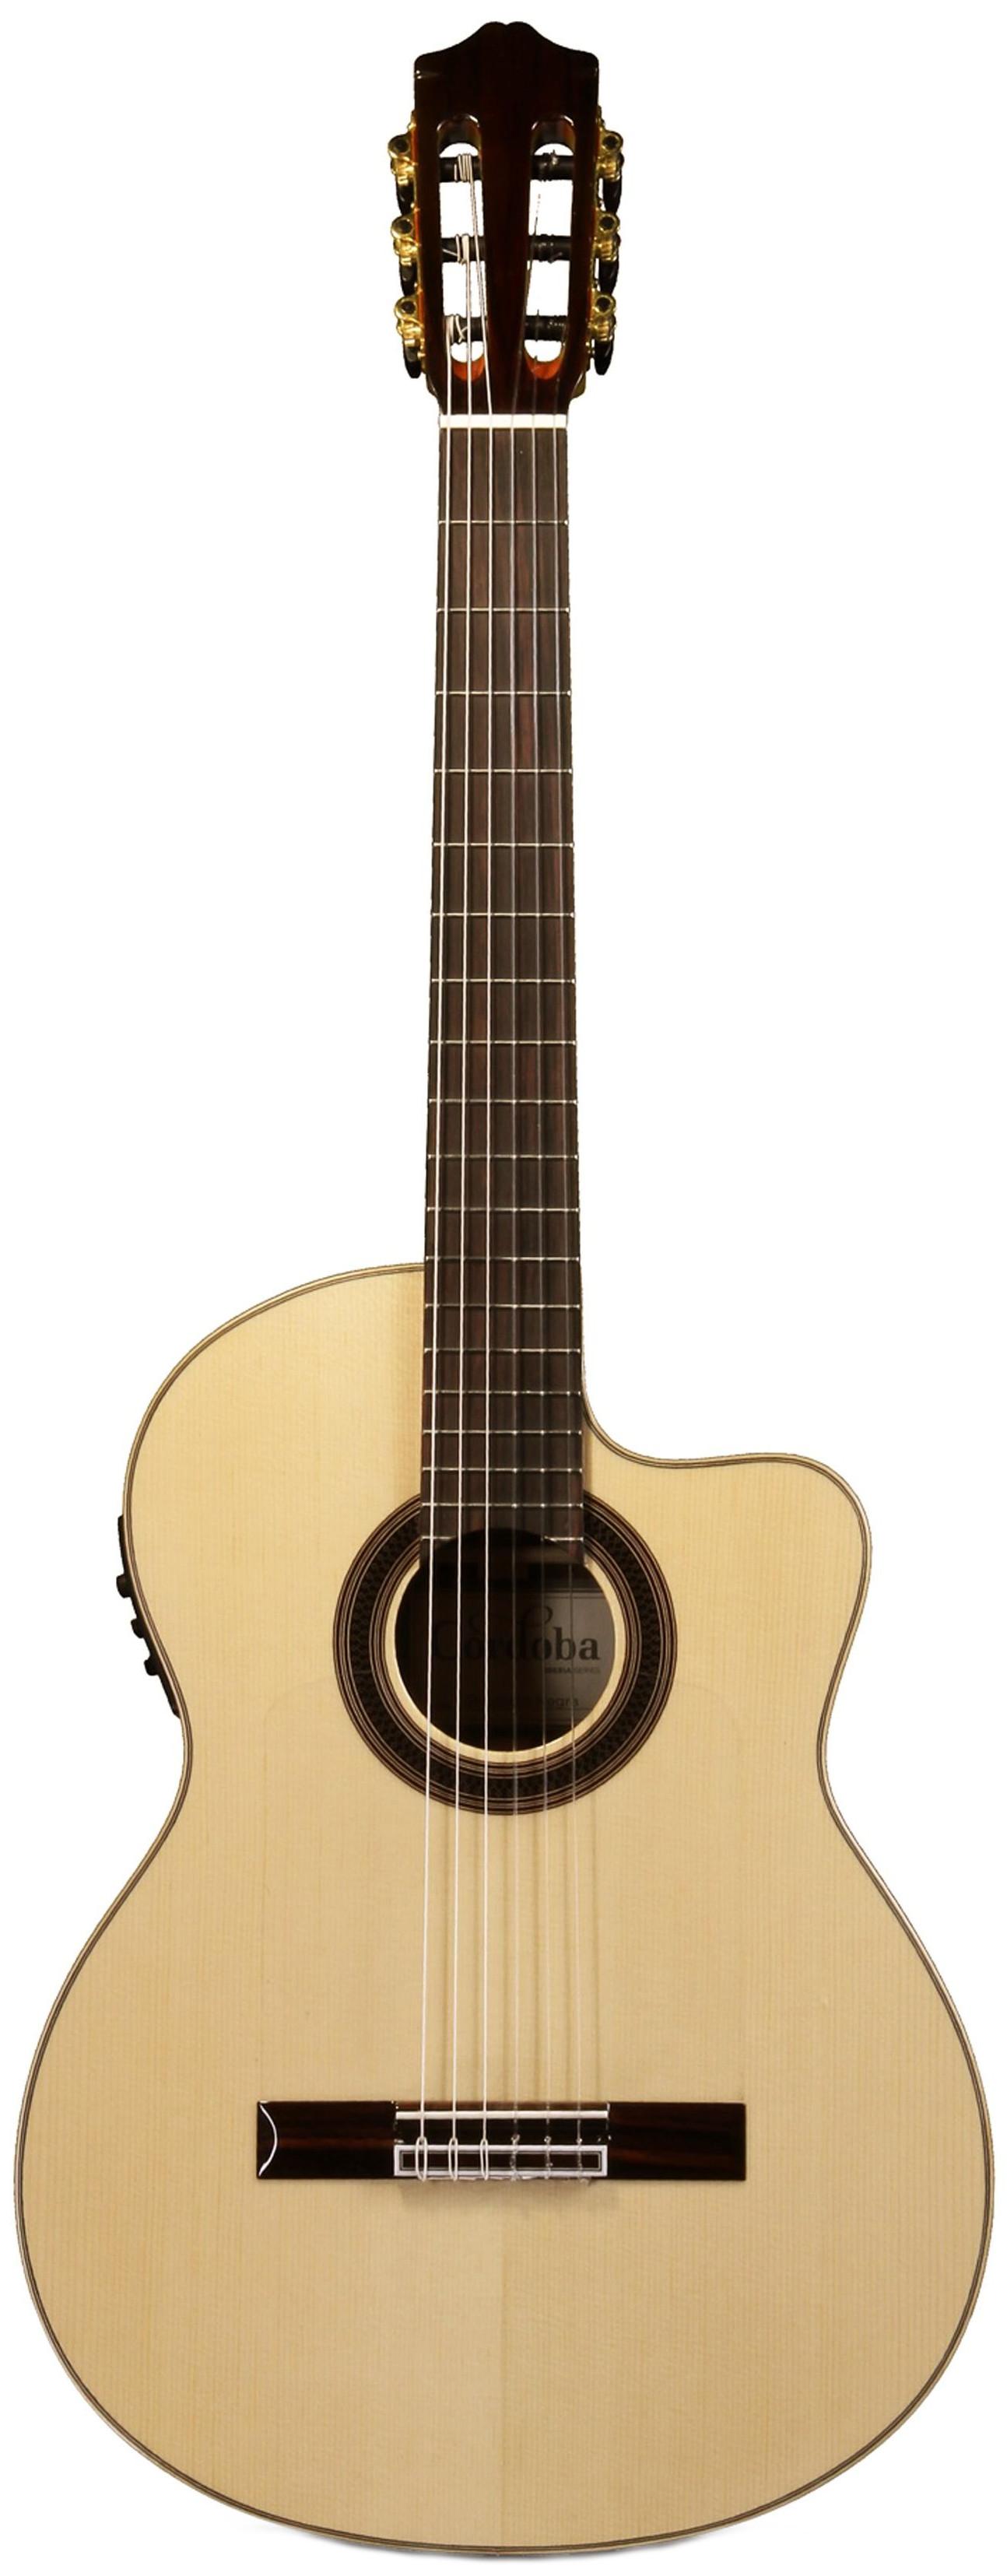 Акустическая гитара Cordoba Iberia GK S…